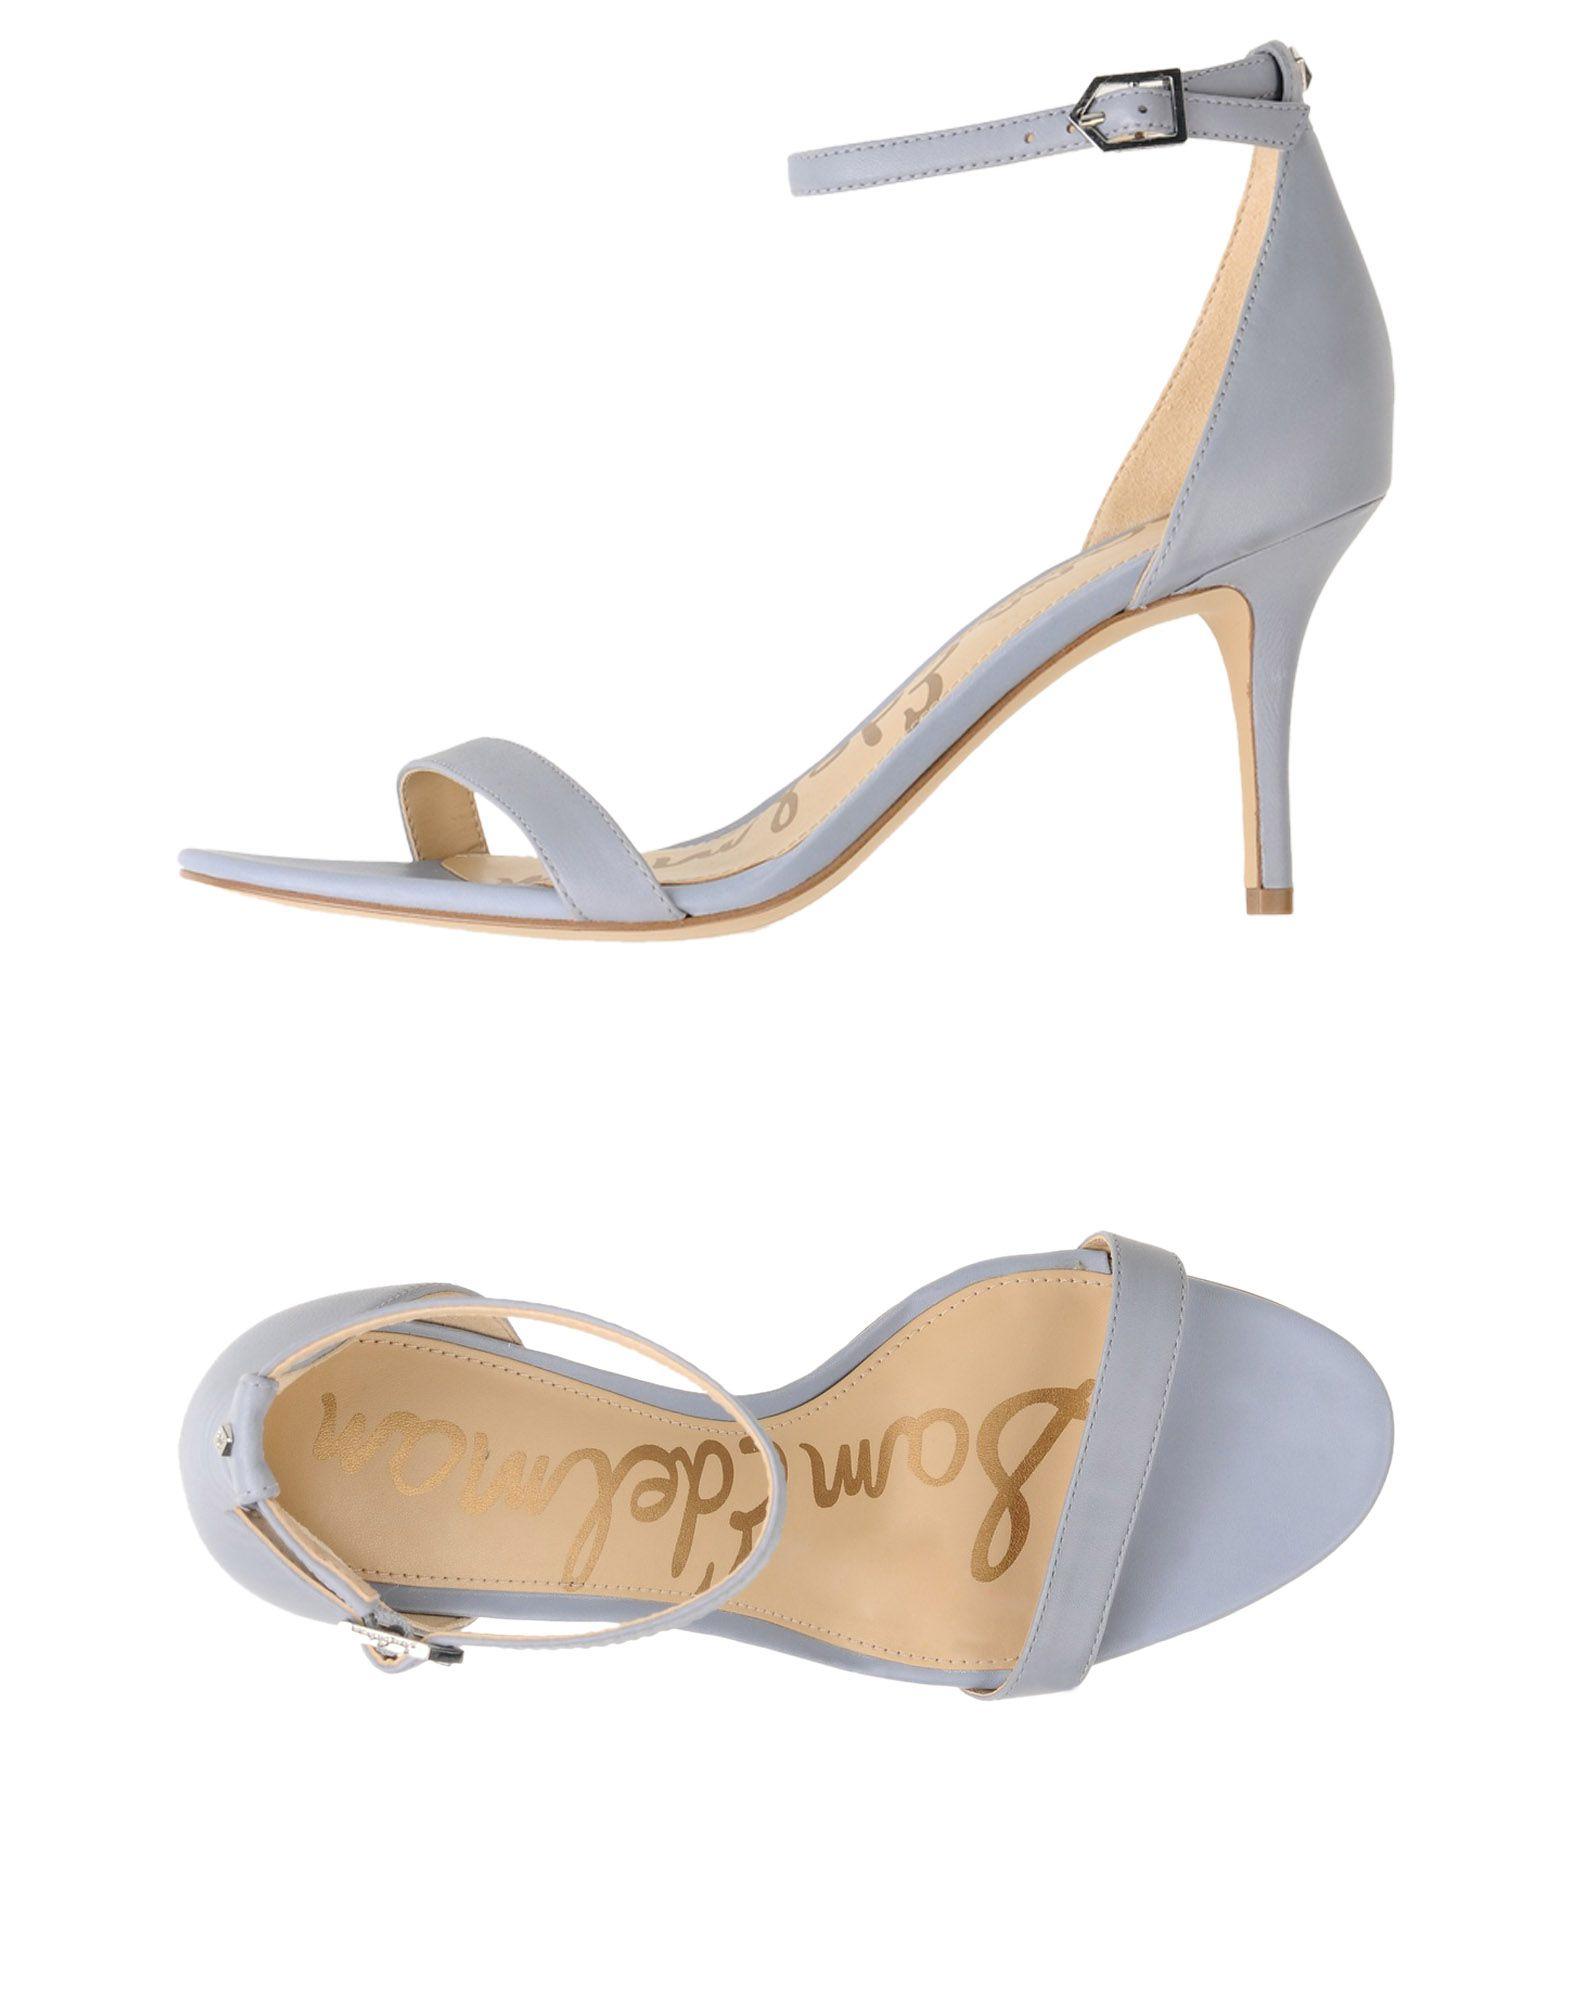 Sam Edelman Sandalen Damen  11347845DR Gute Qualität beliebte Schuhe